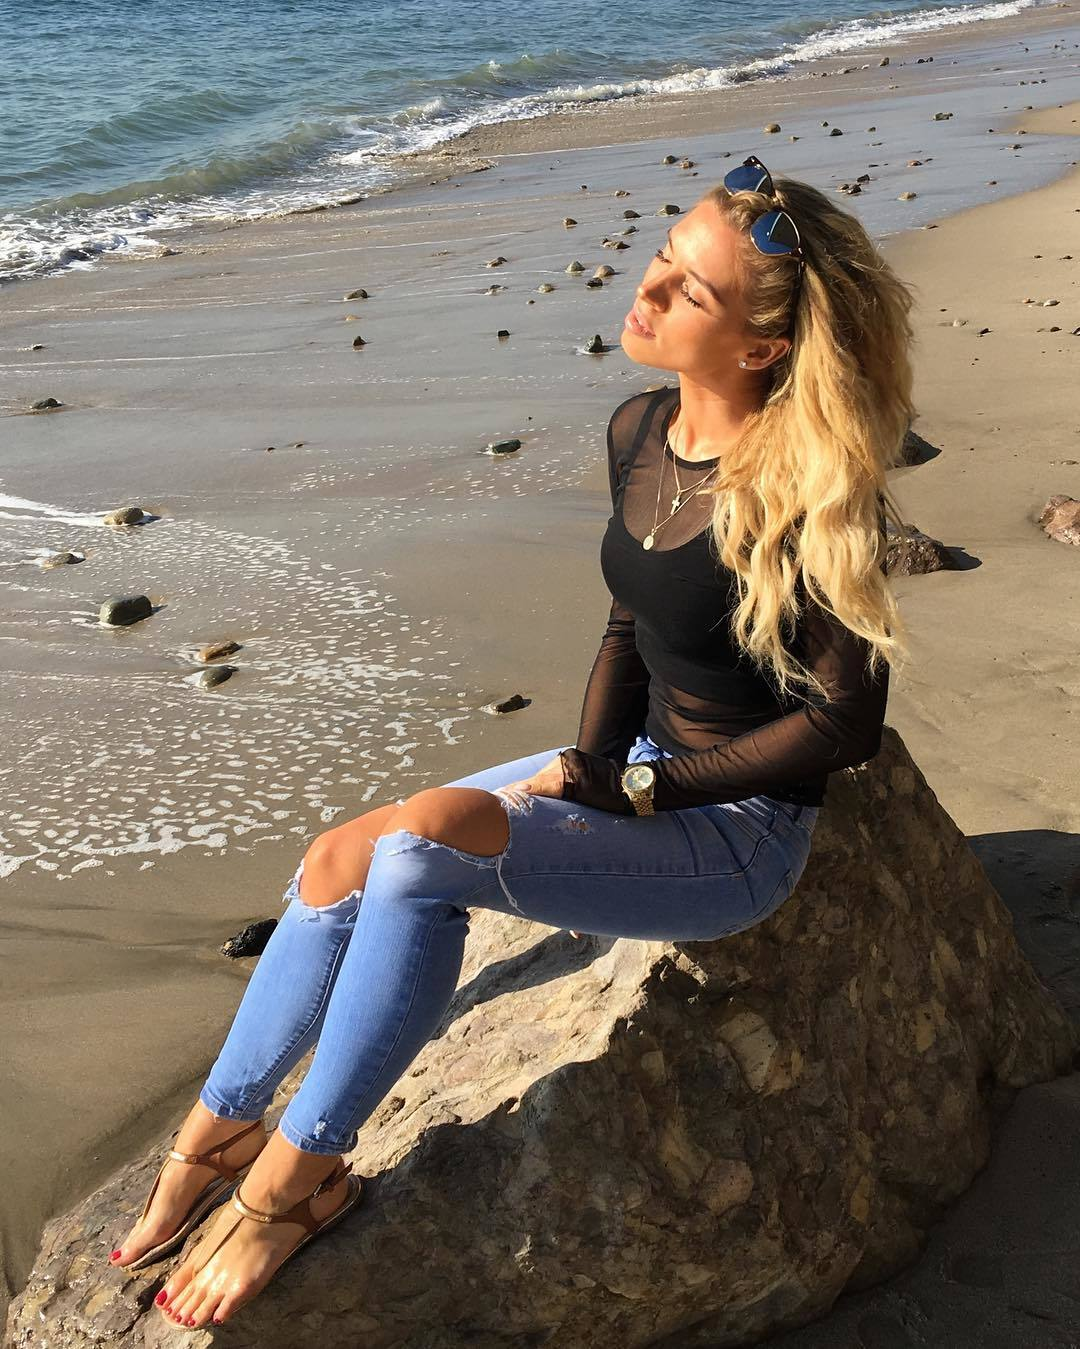 Fuck Carly Chaikin nudes (33 photo), Tits, Paparazzi, Boobs, see through 2017